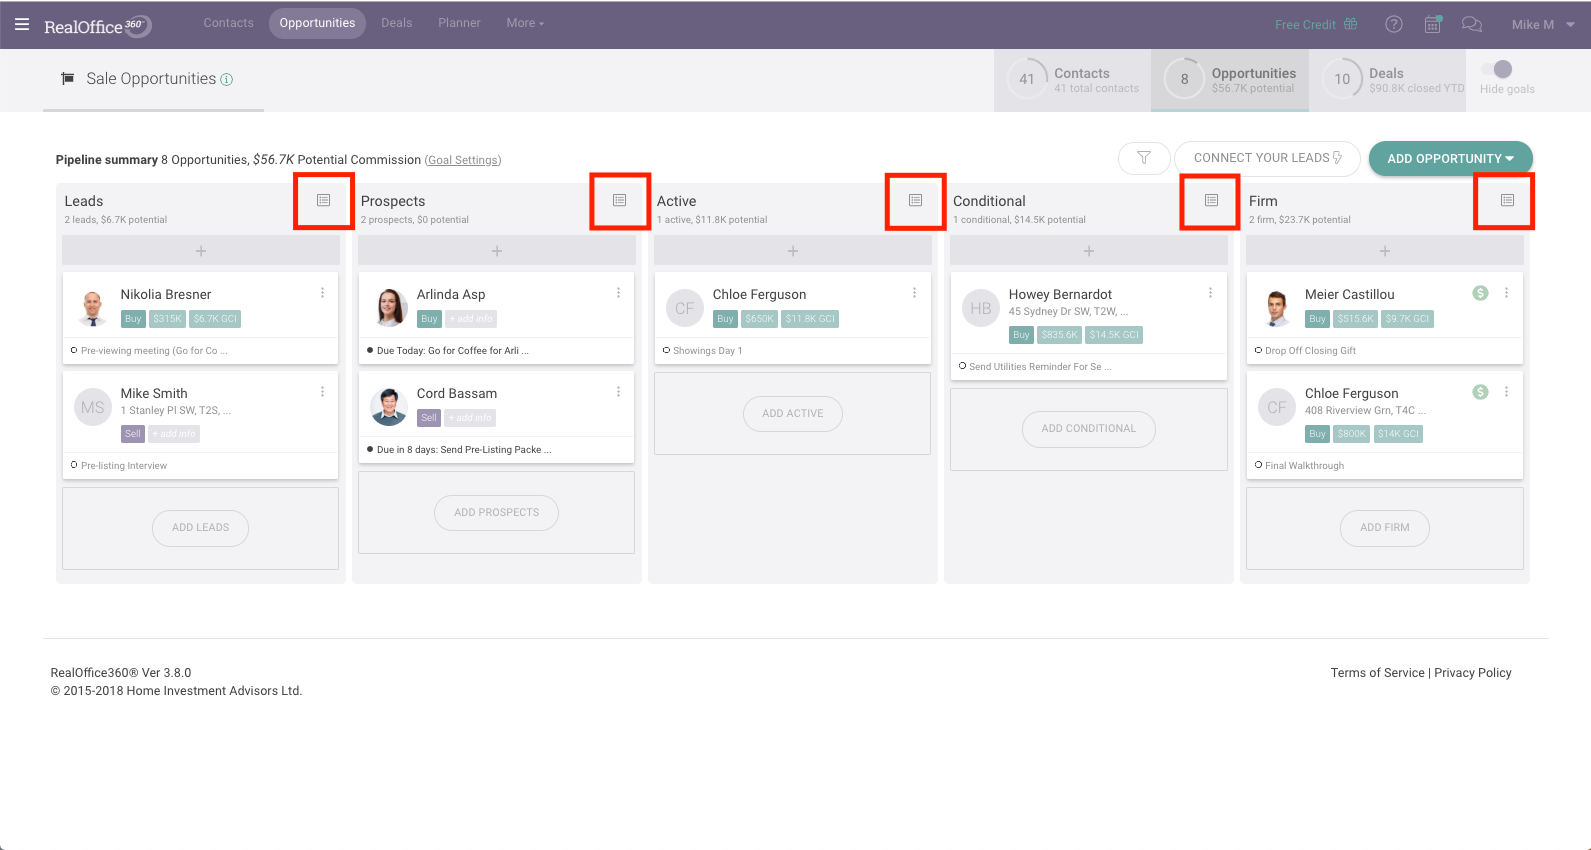 Customize Checklist on Opportunity Tracker RealOffice360